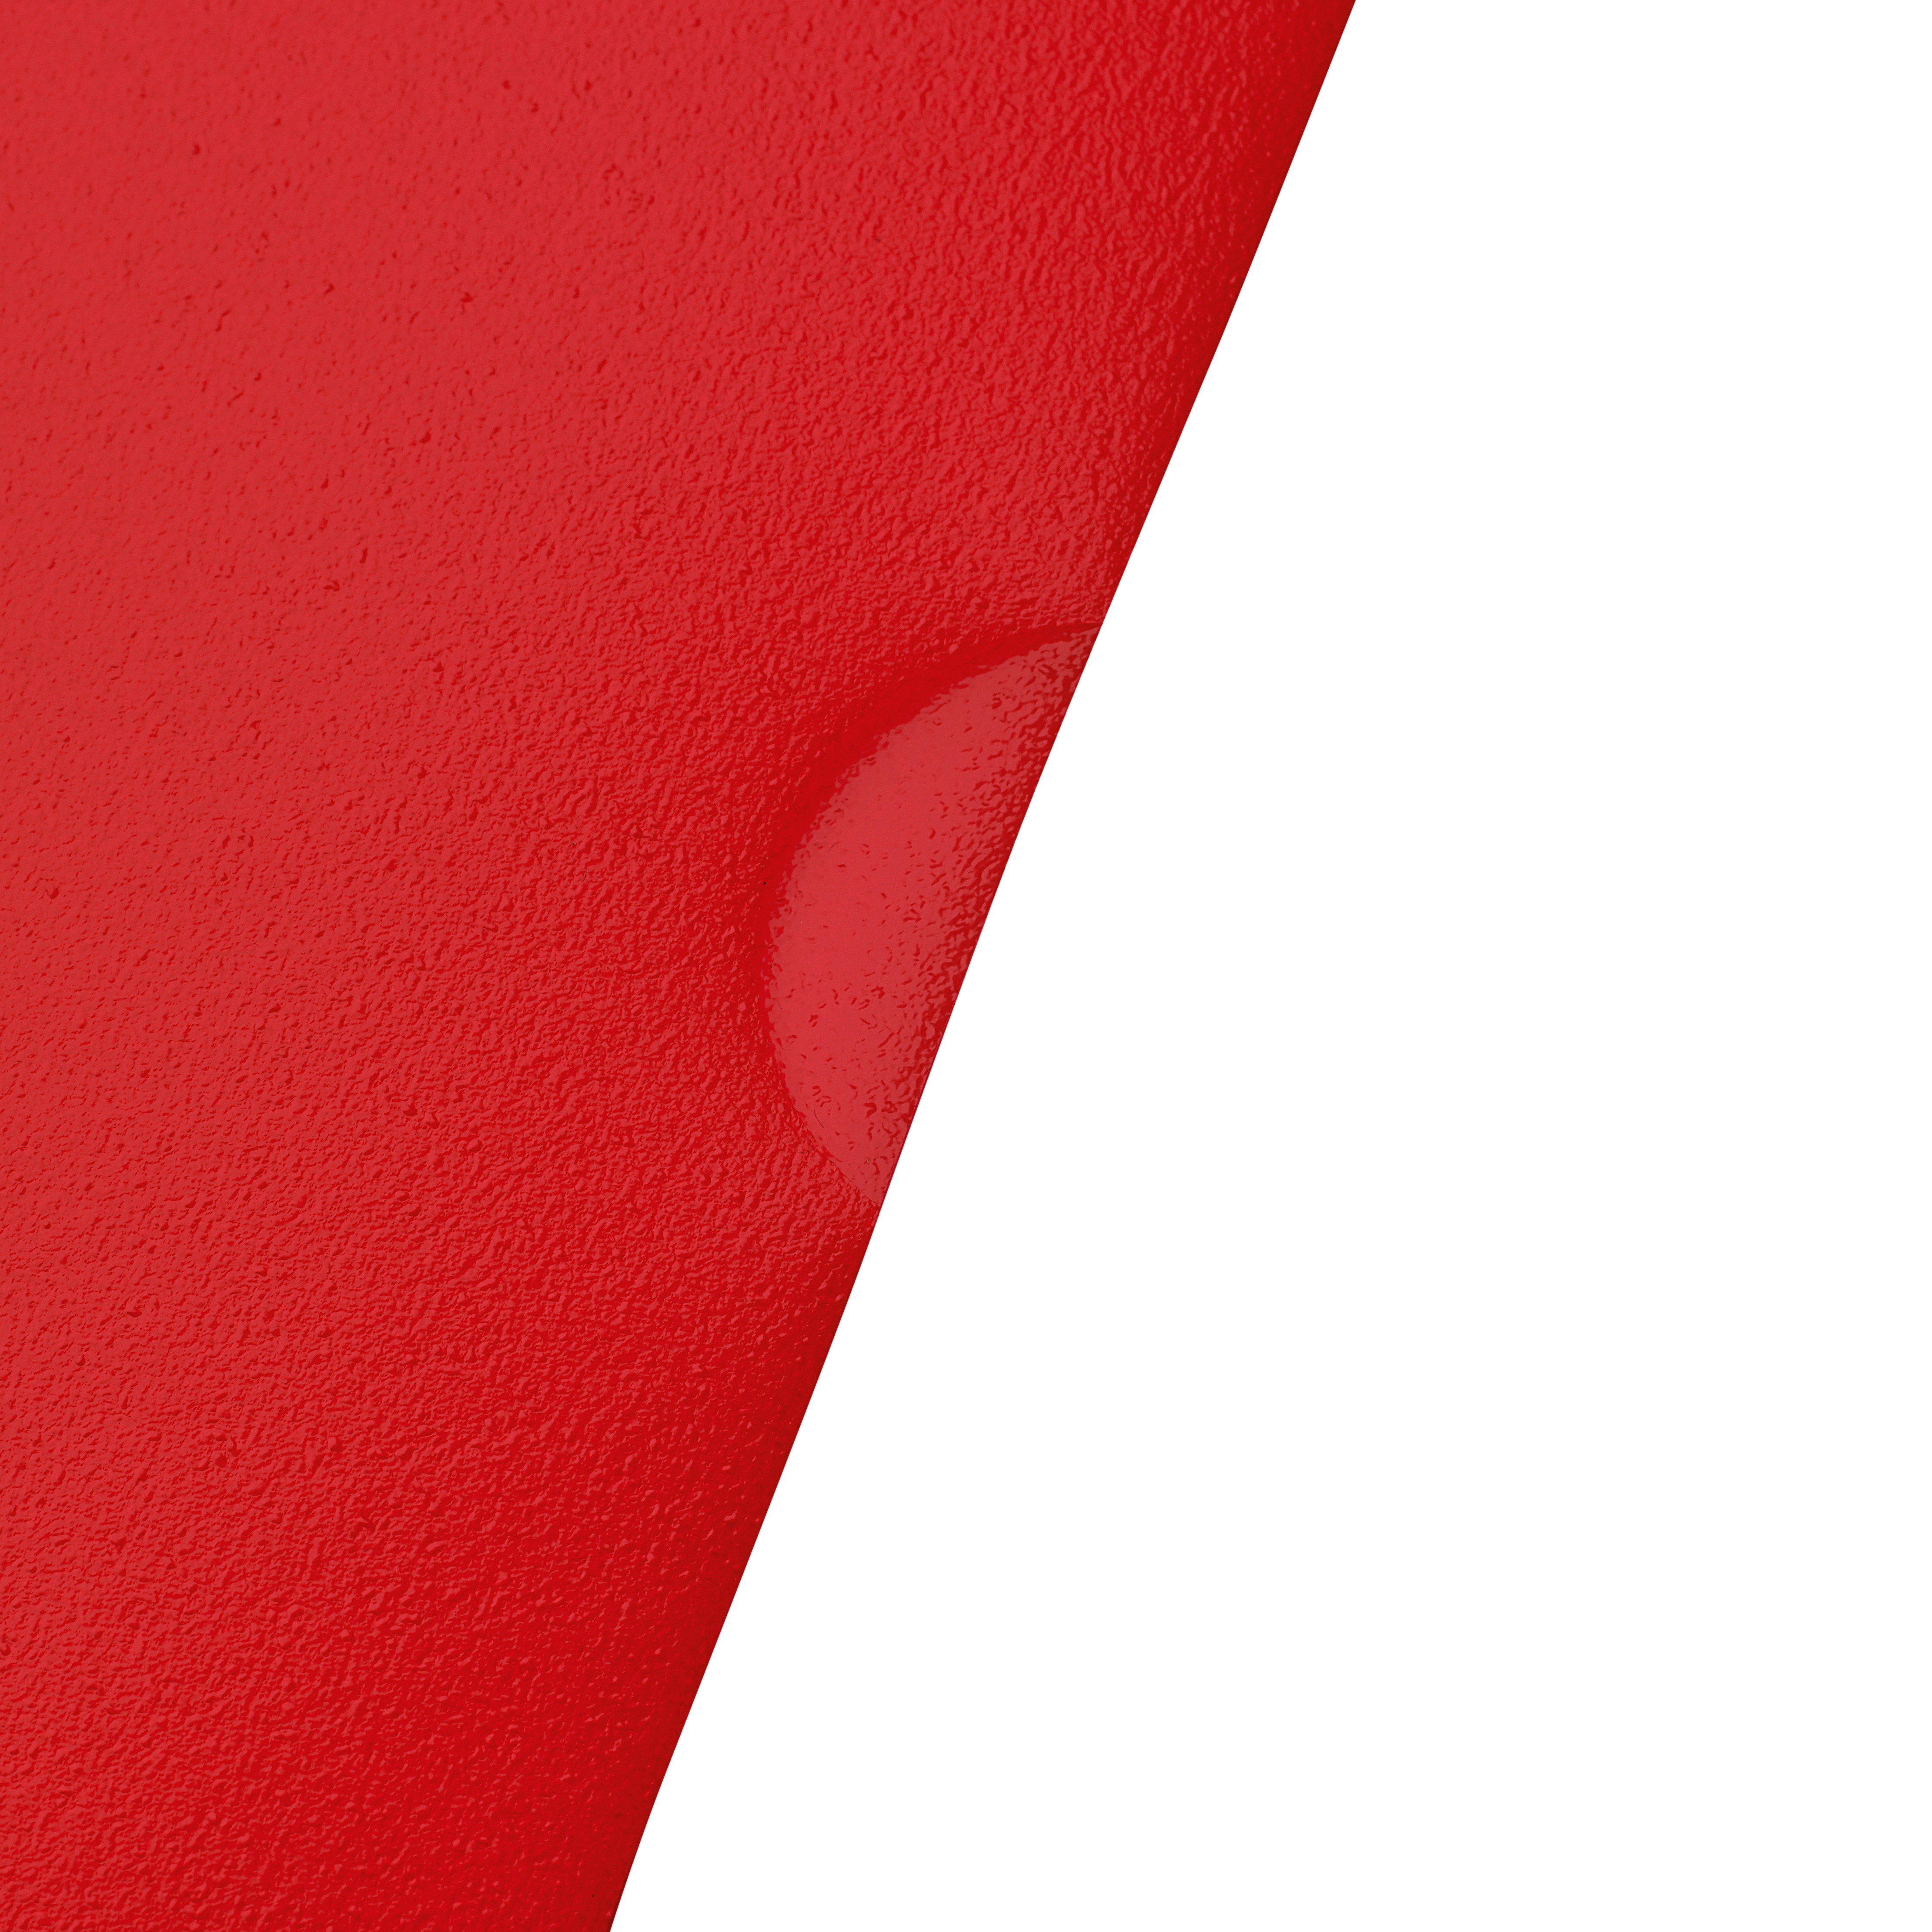 5 Star Office Folder Embossed Cut Flush Polypropylene Copy-safe Translucent 110 Micron A4 Red Pack 25